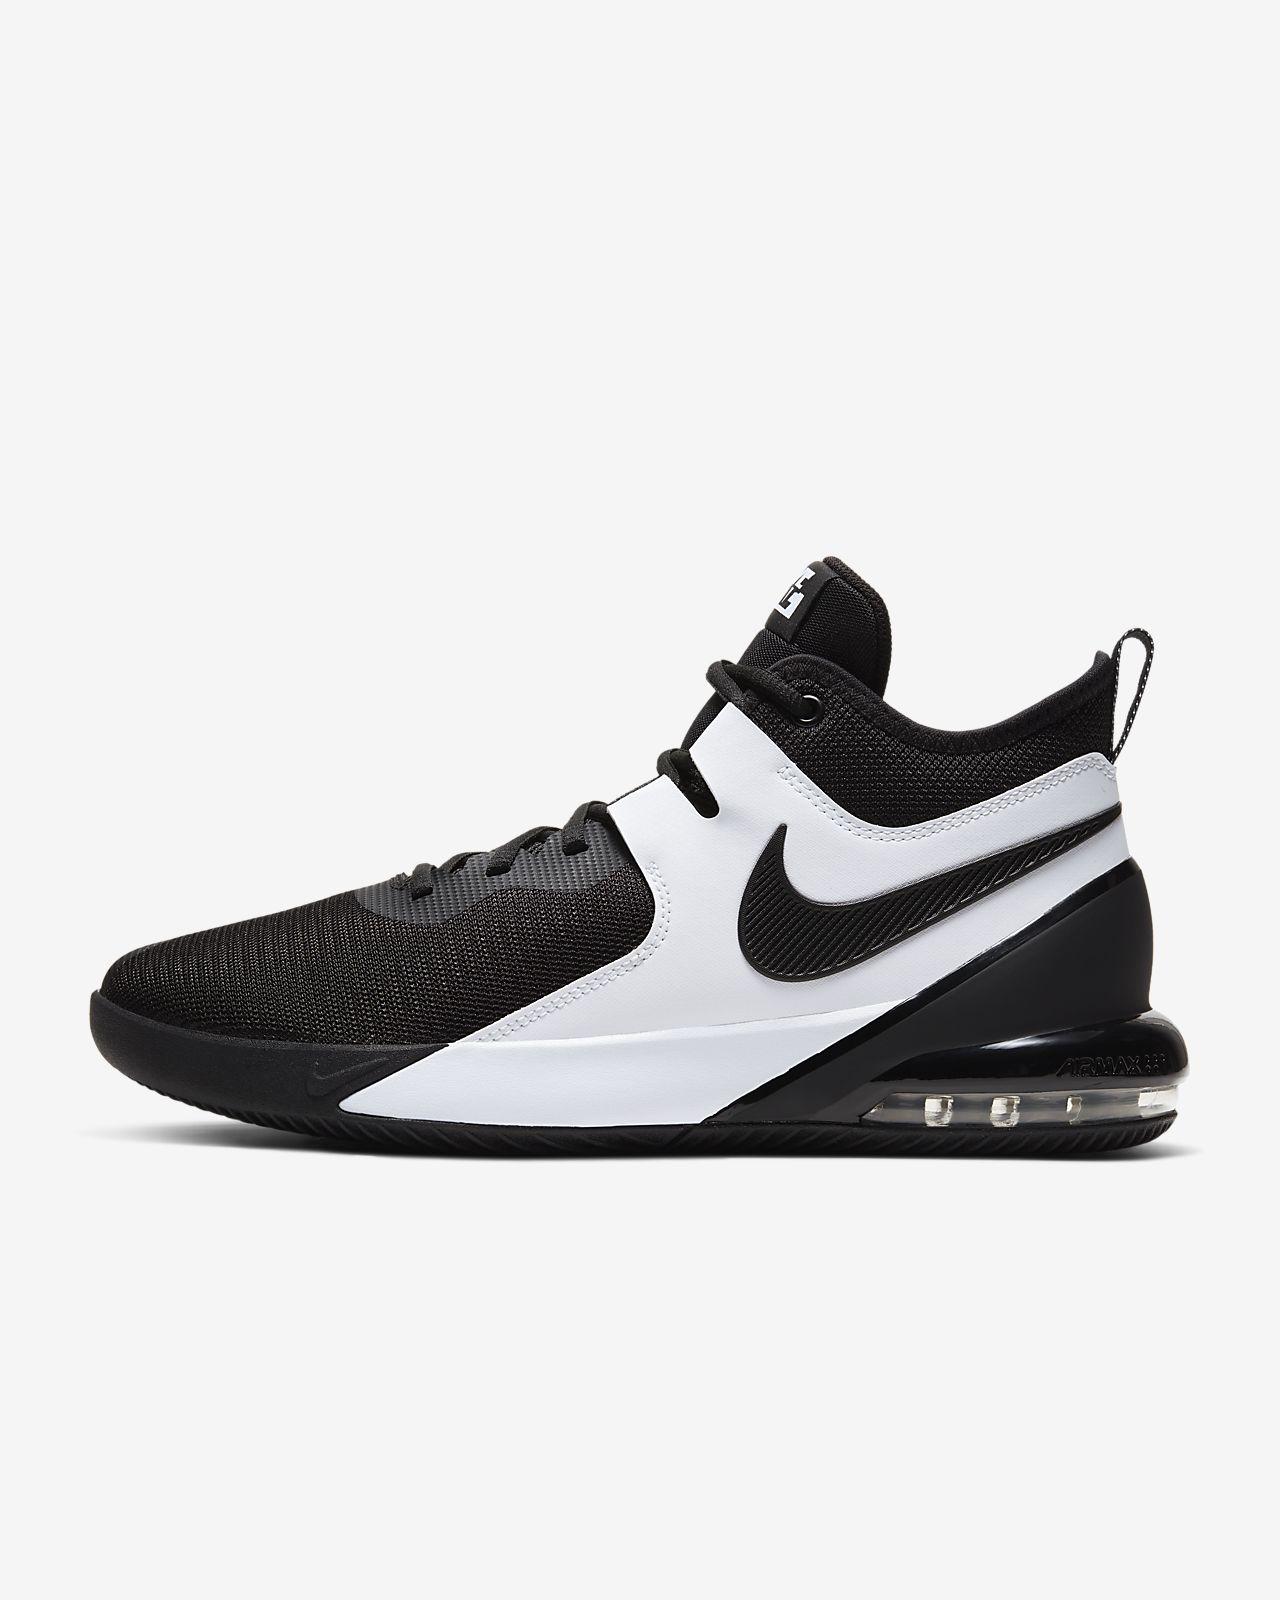 Nike Air Max Impact Basketball Shoe